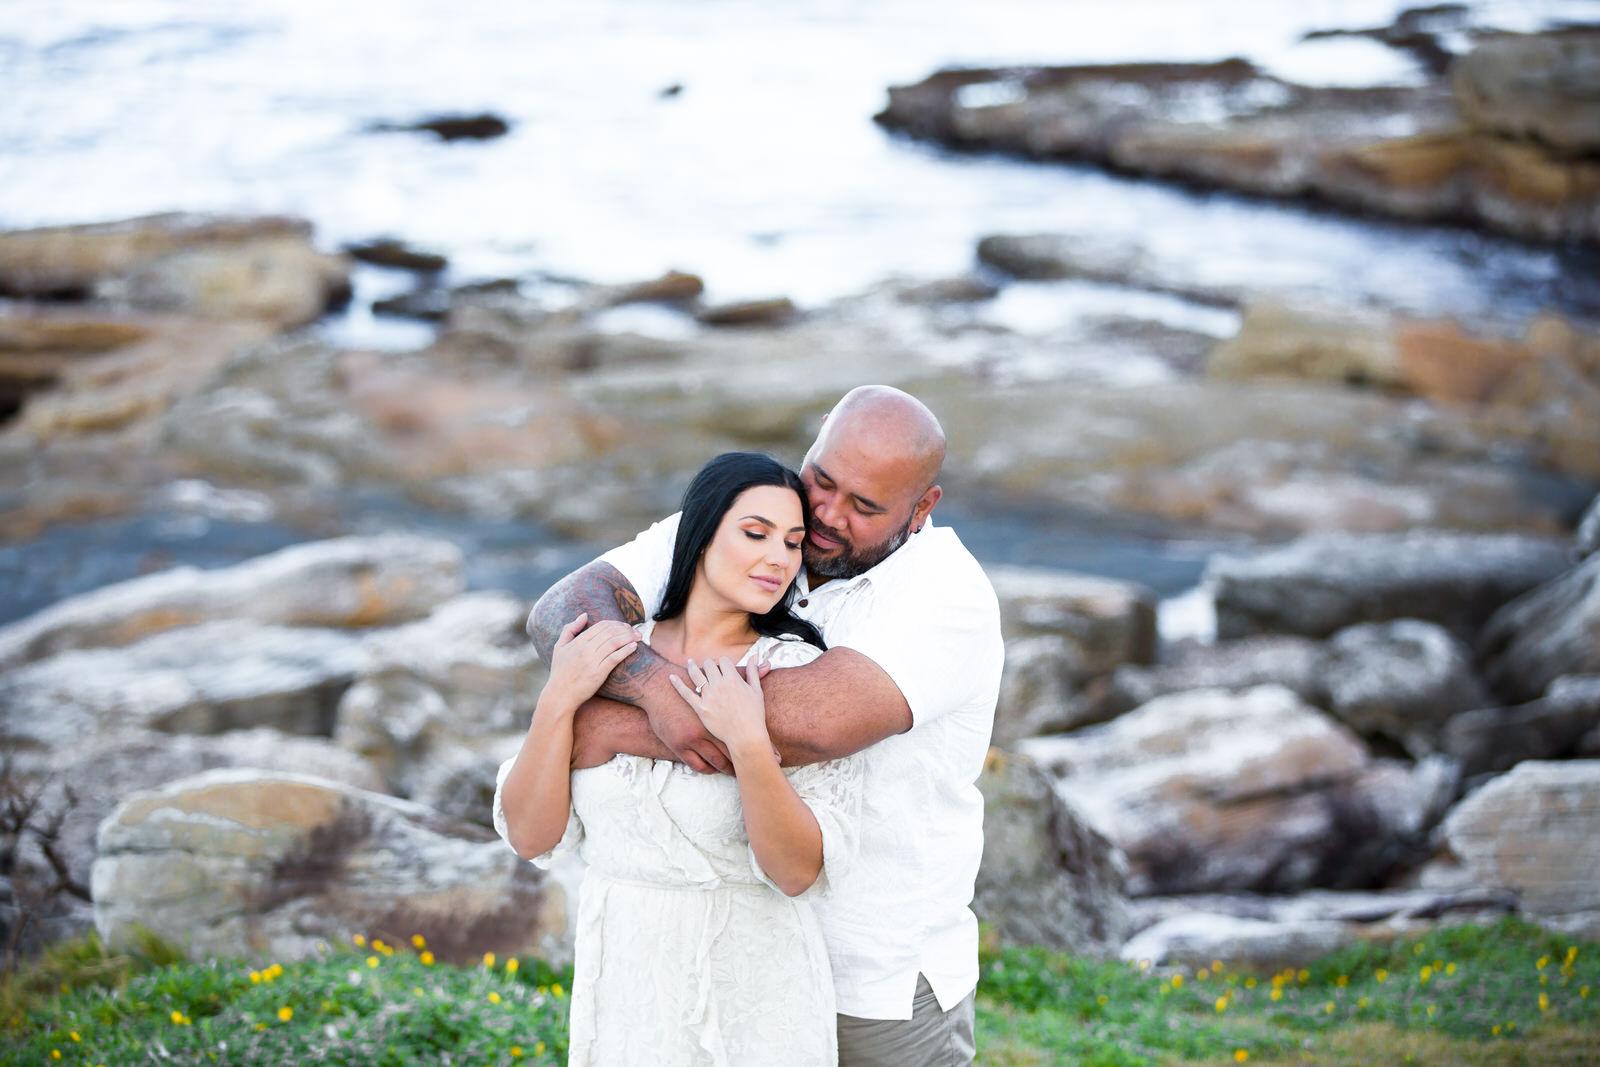 Sydney Wedding Photographer - Maroubra Beach - Jennifer Lam Photography (17).jpg